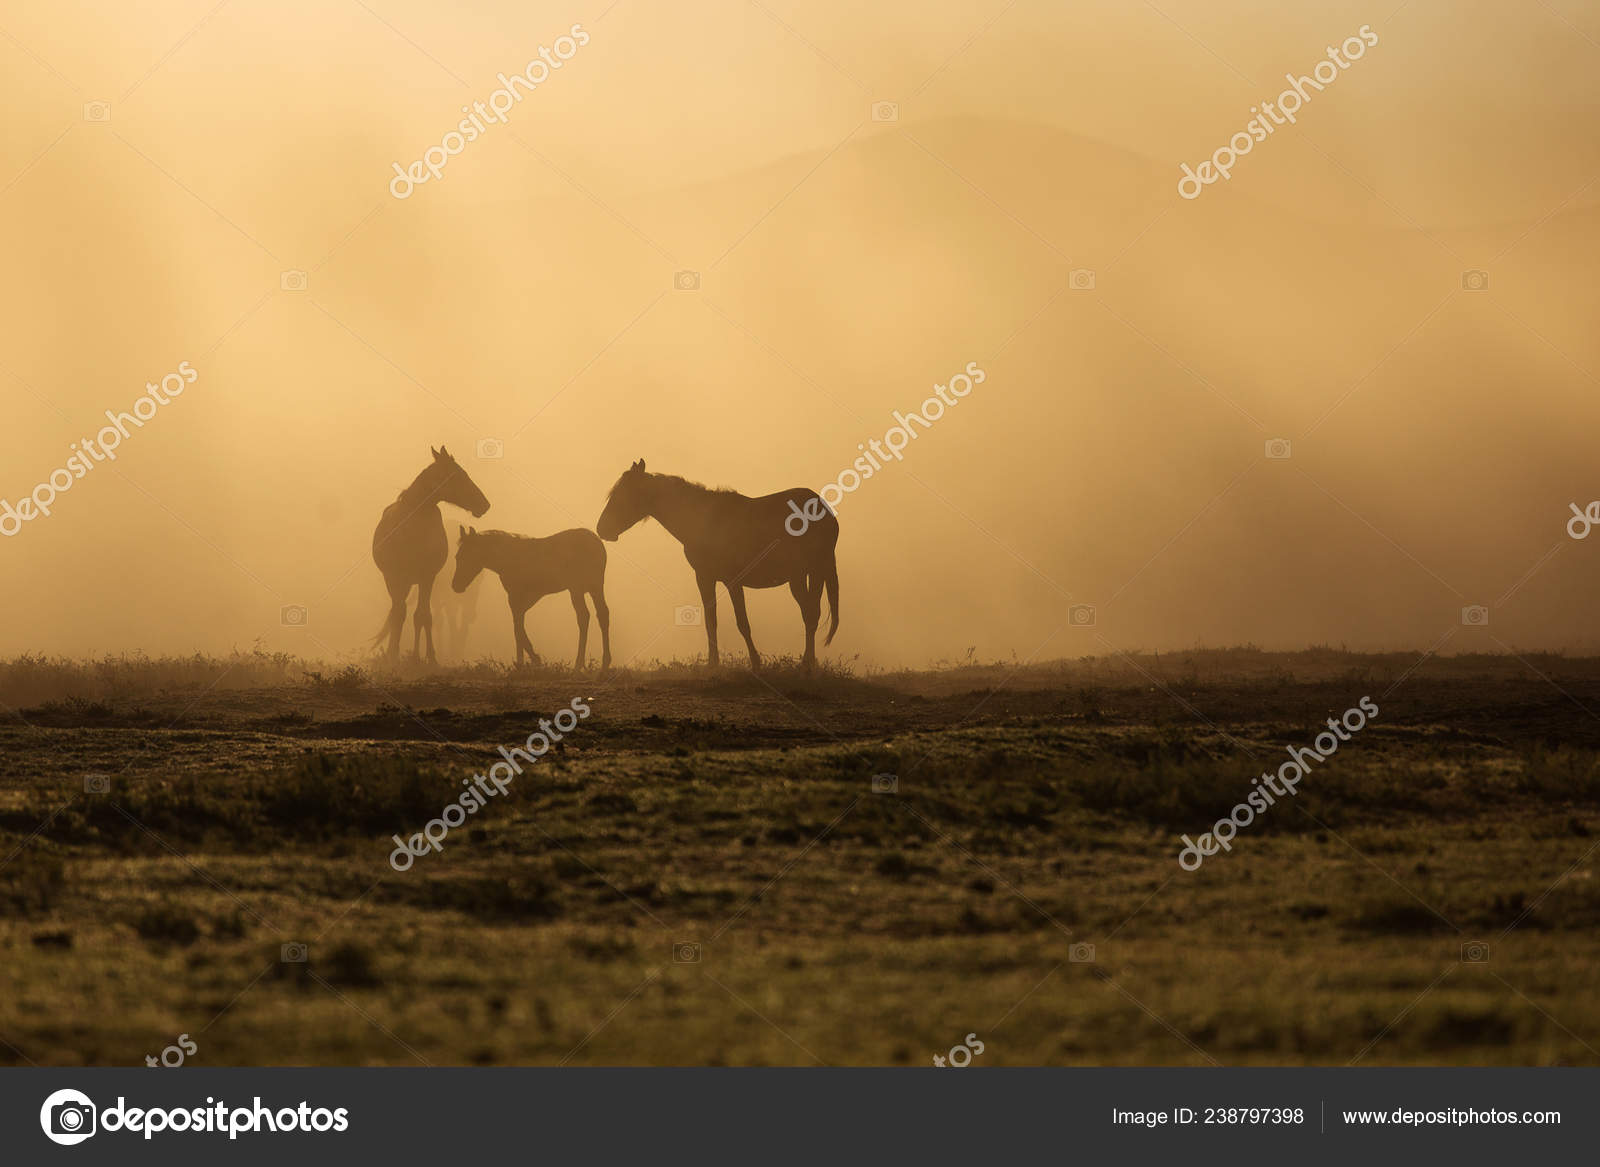 Wild Horses Running Sunset Landscape Wild Horses Running Sunset Dust Background Stock Photo C Danmir12 238797398